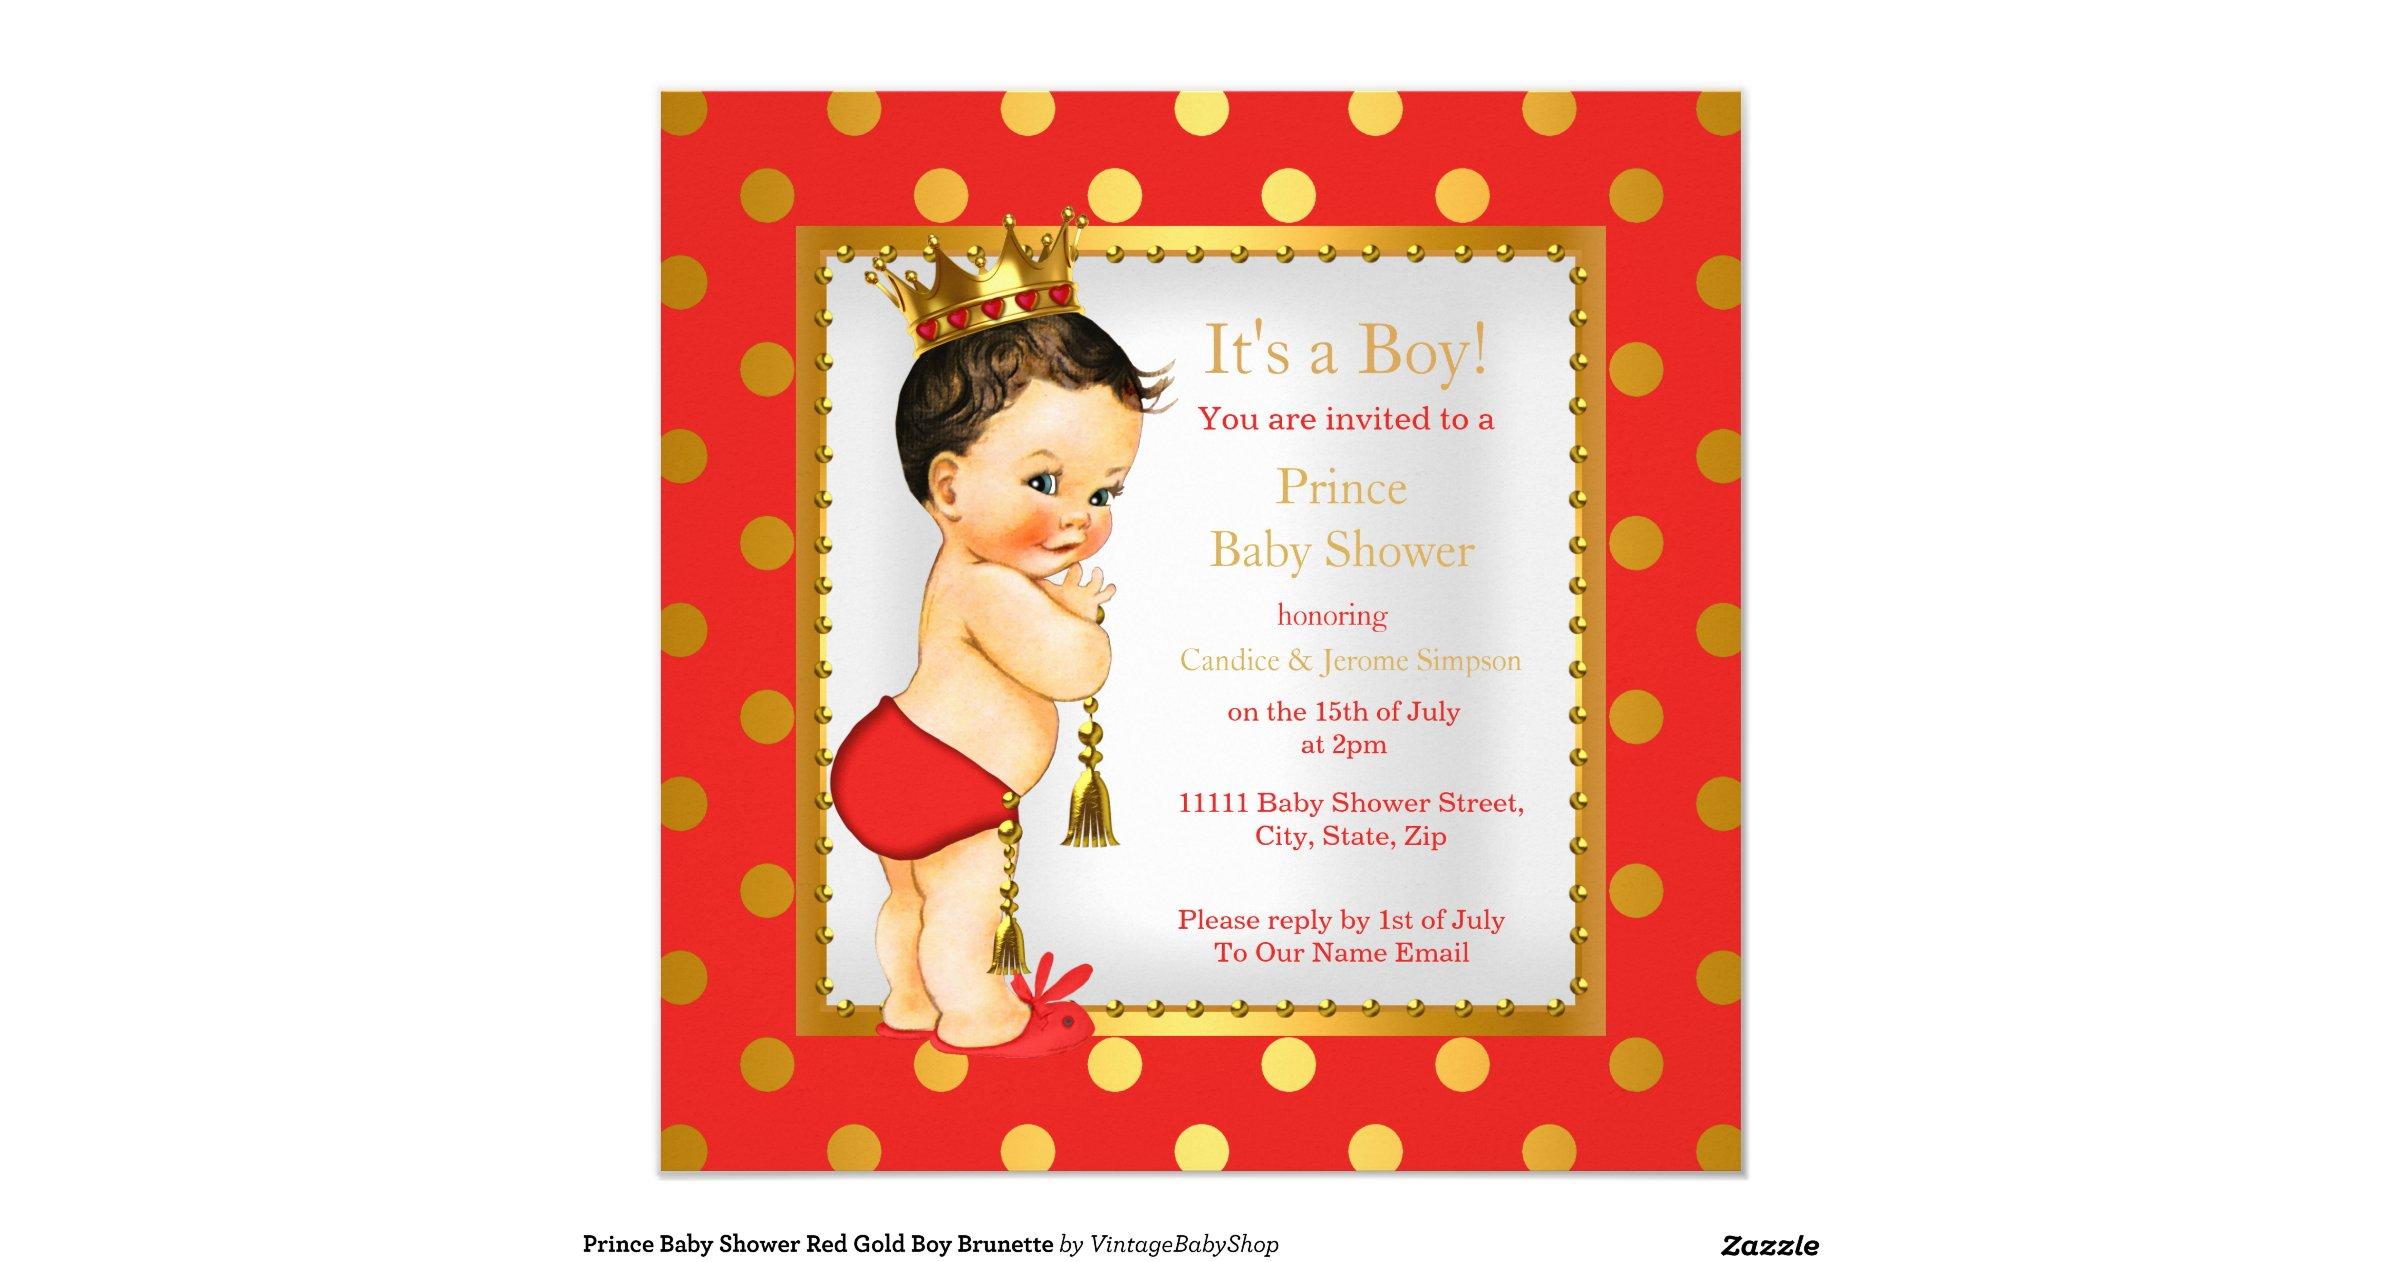 prince baby shower red gold boy brunette invitation